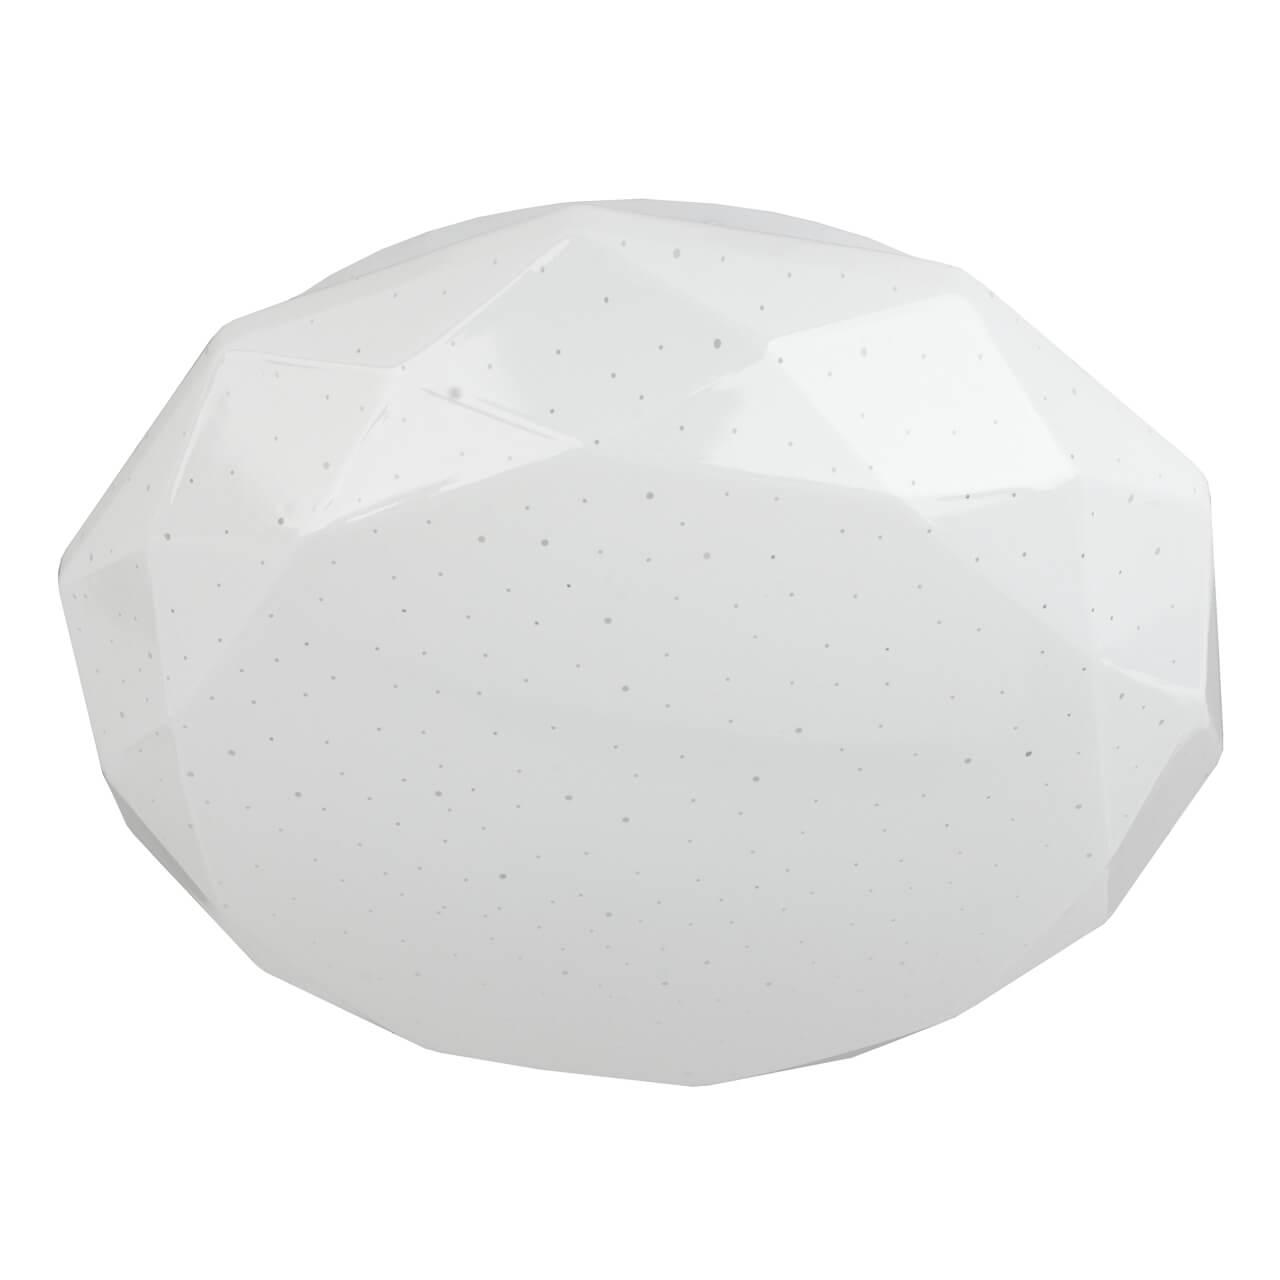 Светильник ЭРА SPB-6-14-4K Sparkle